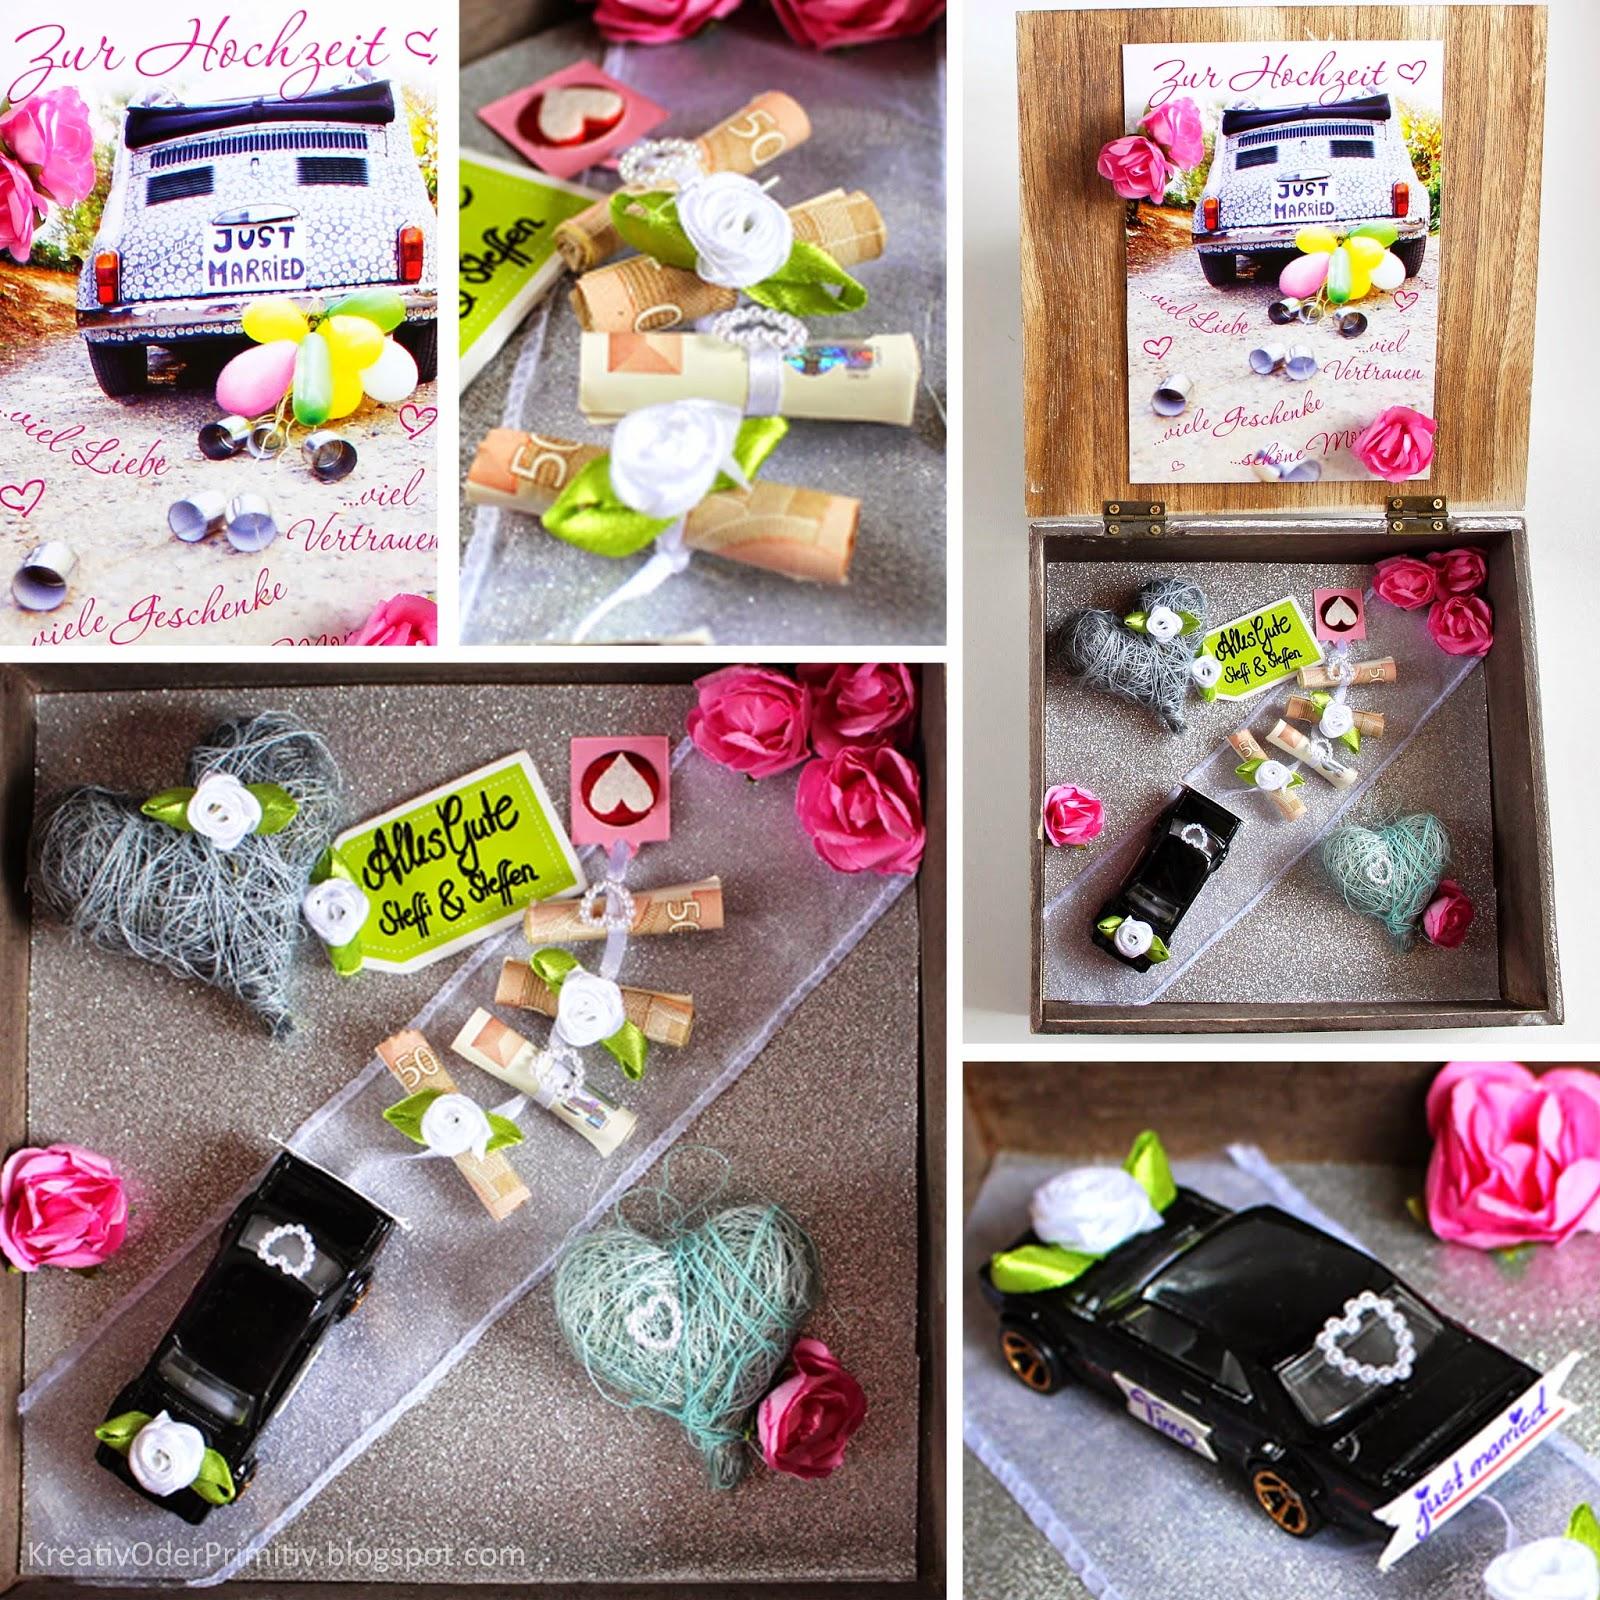 Geldgeschenk zur Hochzeit kreativ Verpackt - HANDMADE Kultur